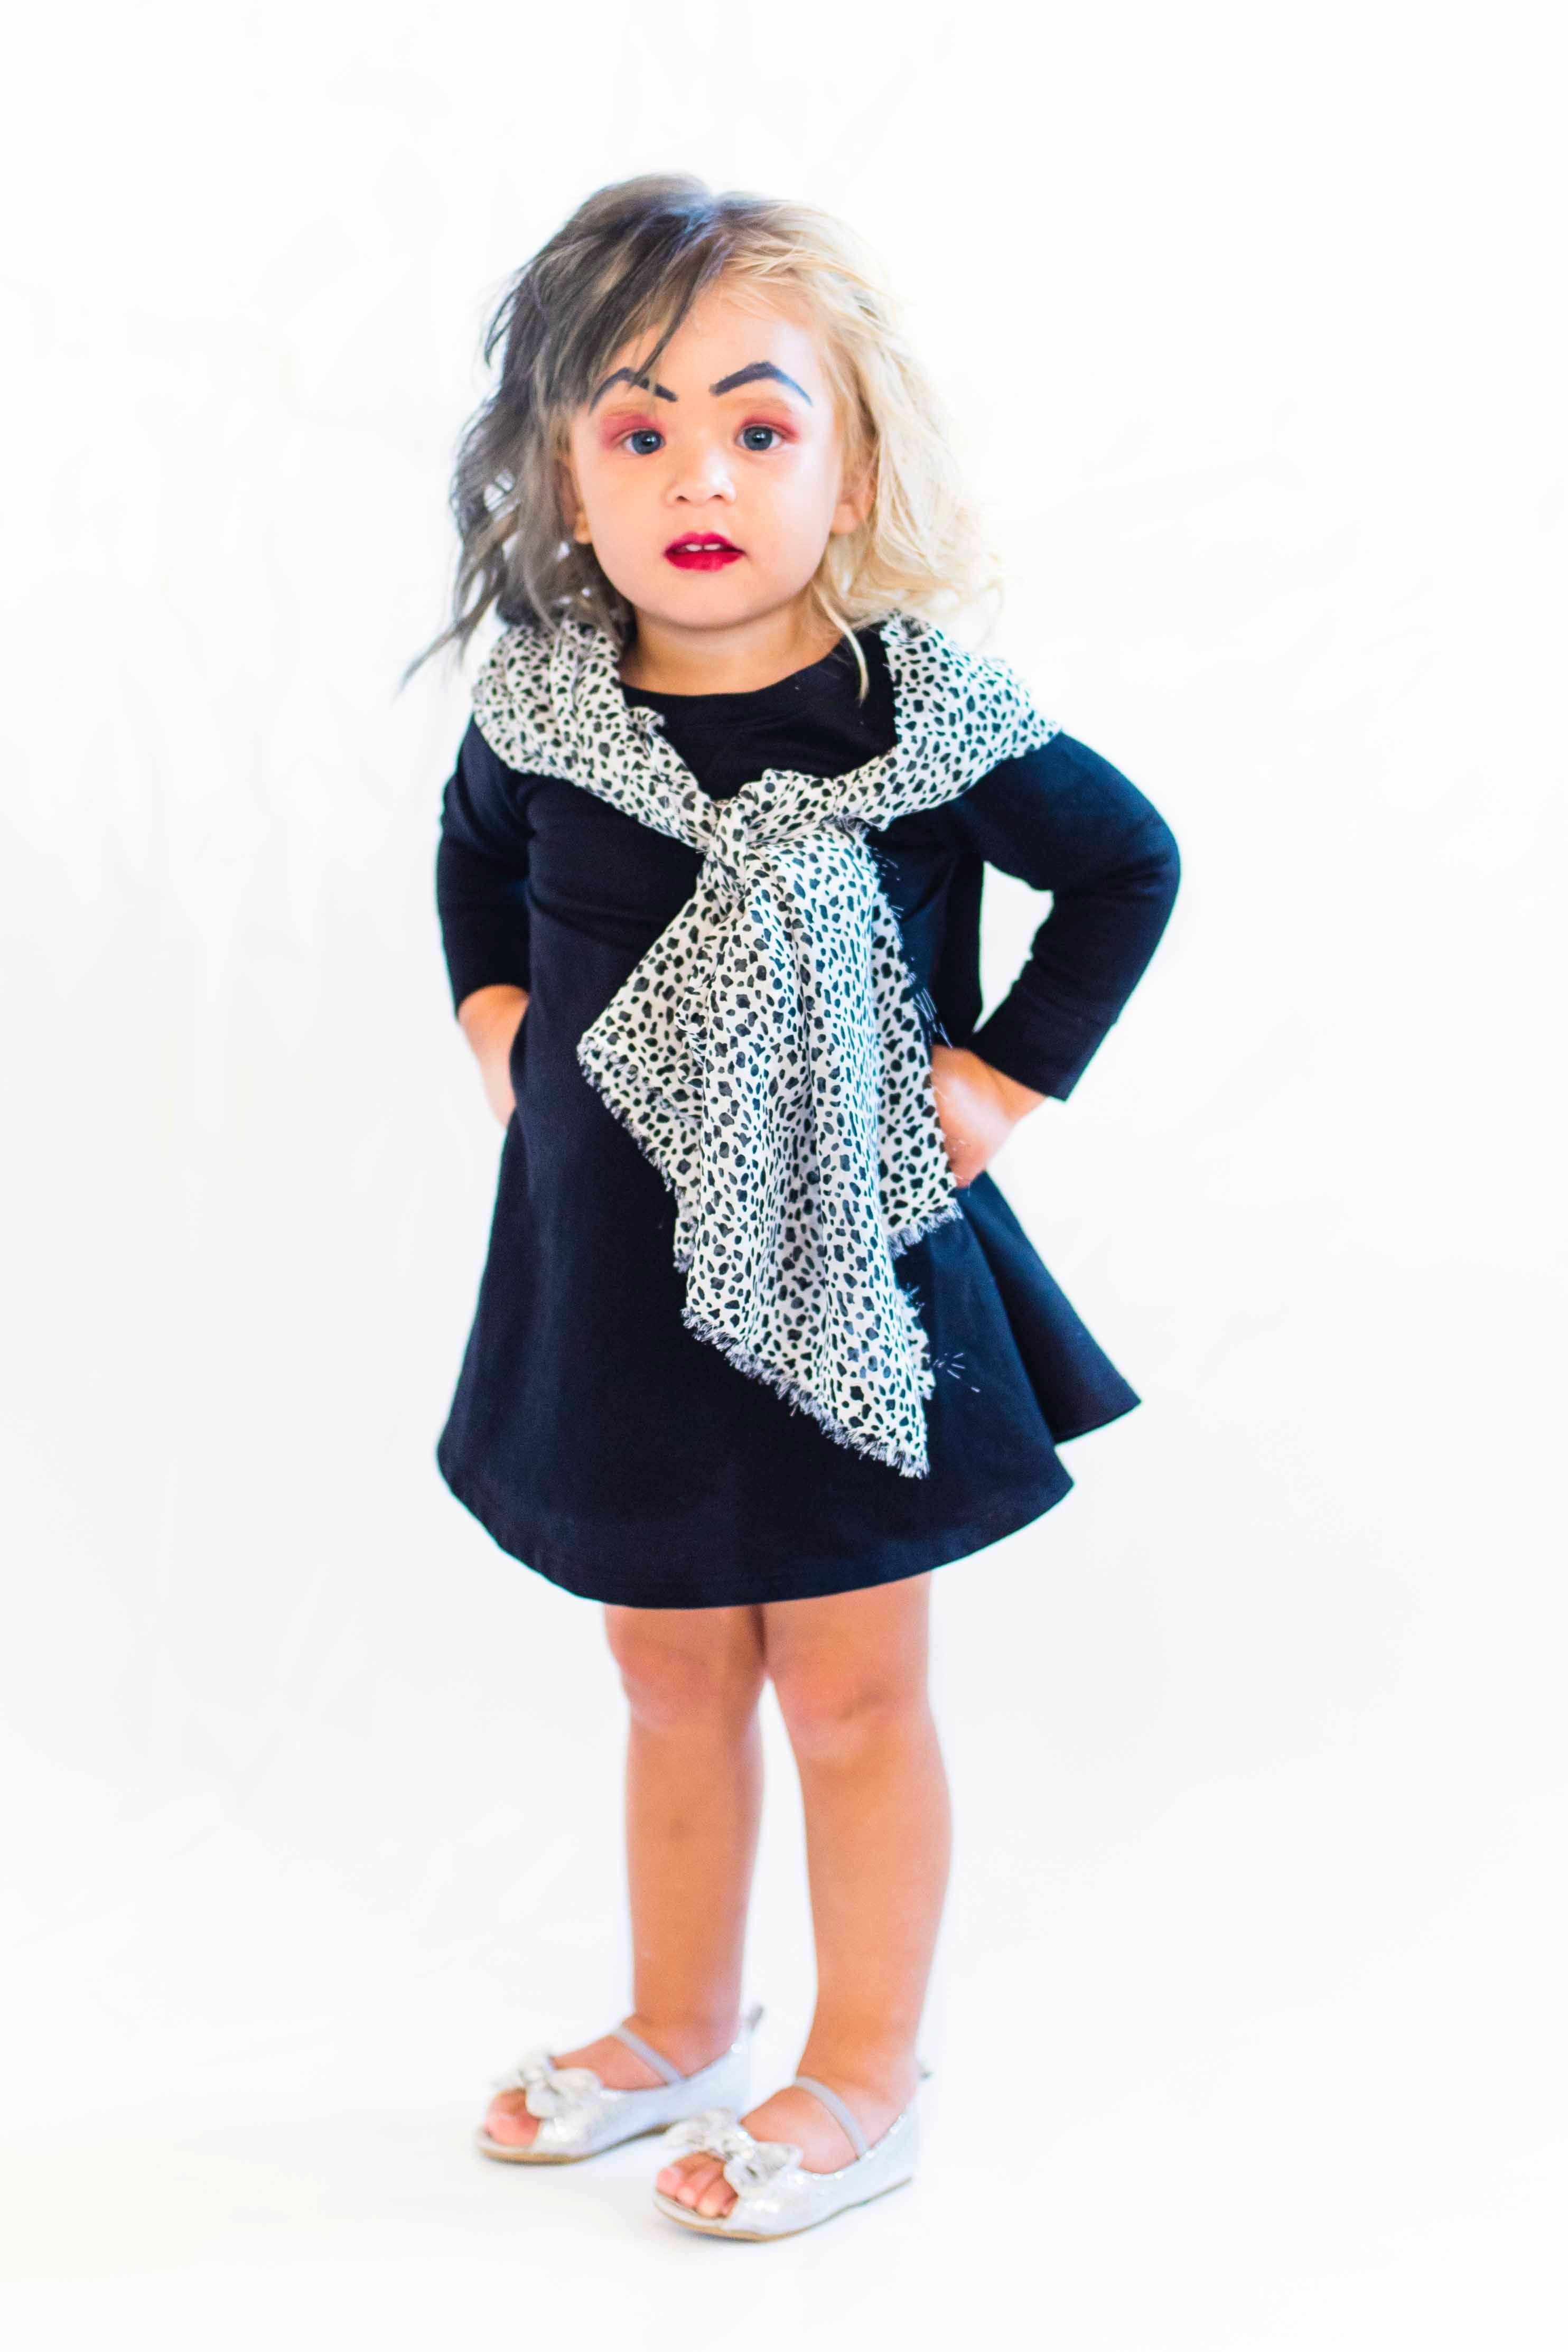 Cruella De Vil Halloween costume! Little girl DIY Halloween ideas!  Manualidades Para Halloween f8043fa7503